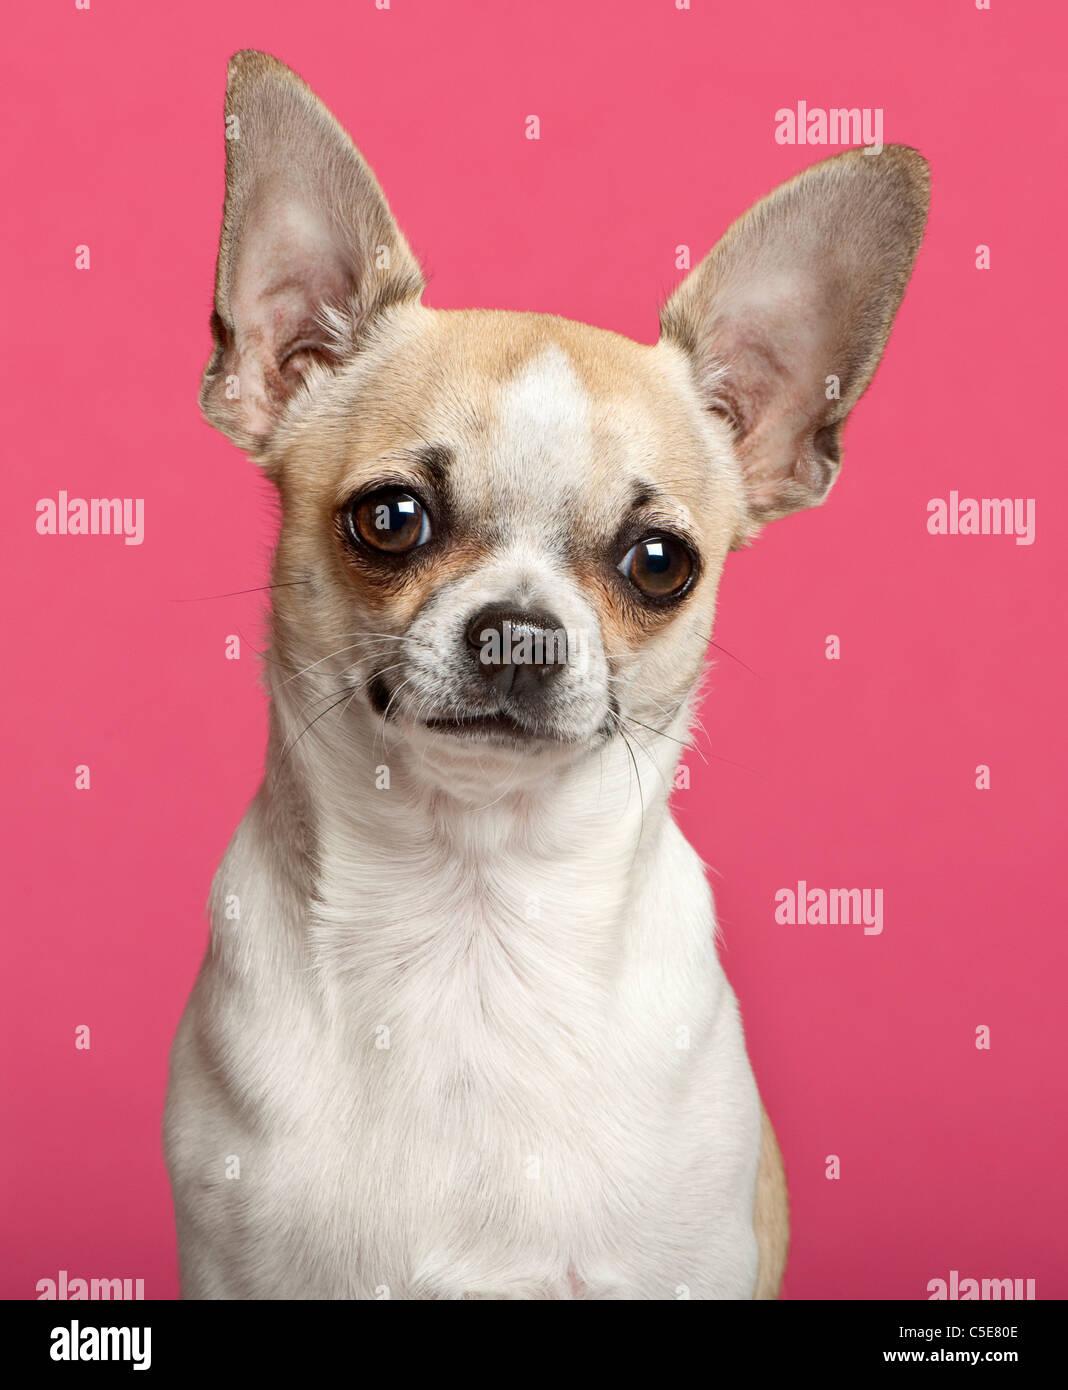 Close-up de Chihuahua, de 9 mois, en face de fond rose Photo Stock